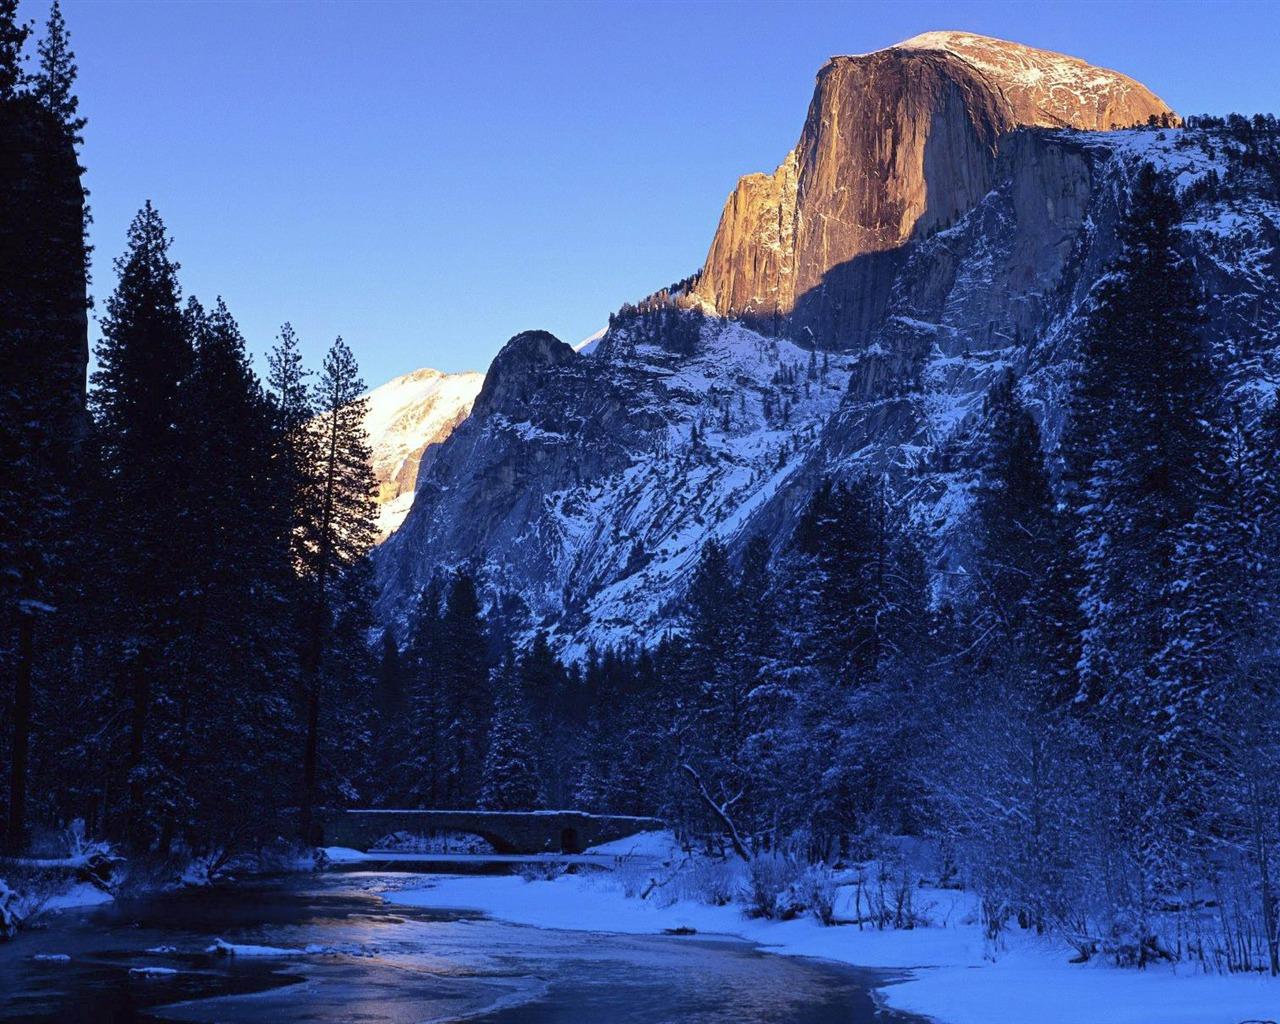 Windows 10 Wallpaper Yosemite: Yosemite National Park